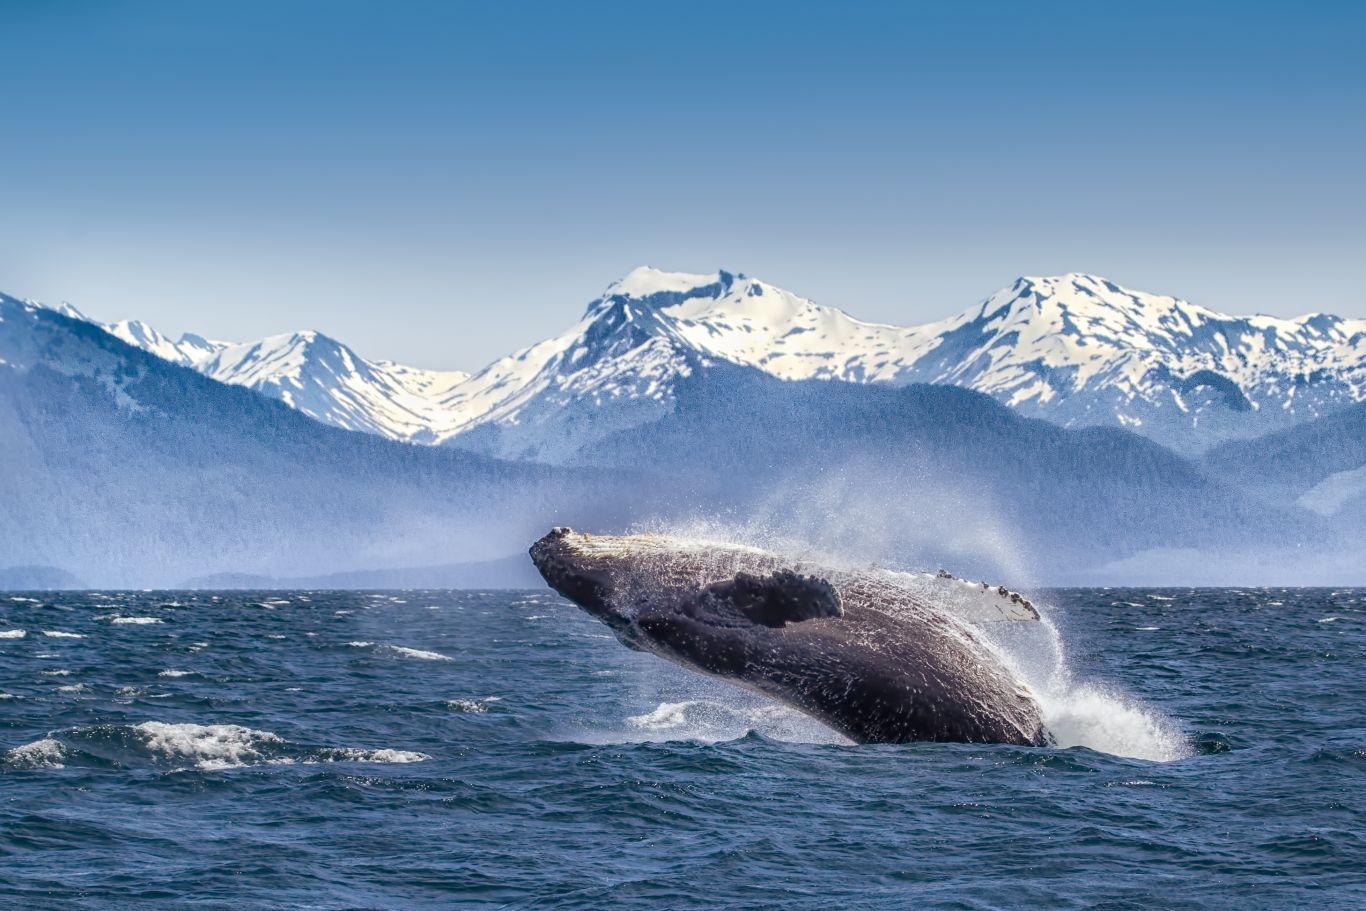 baleias antártica 4